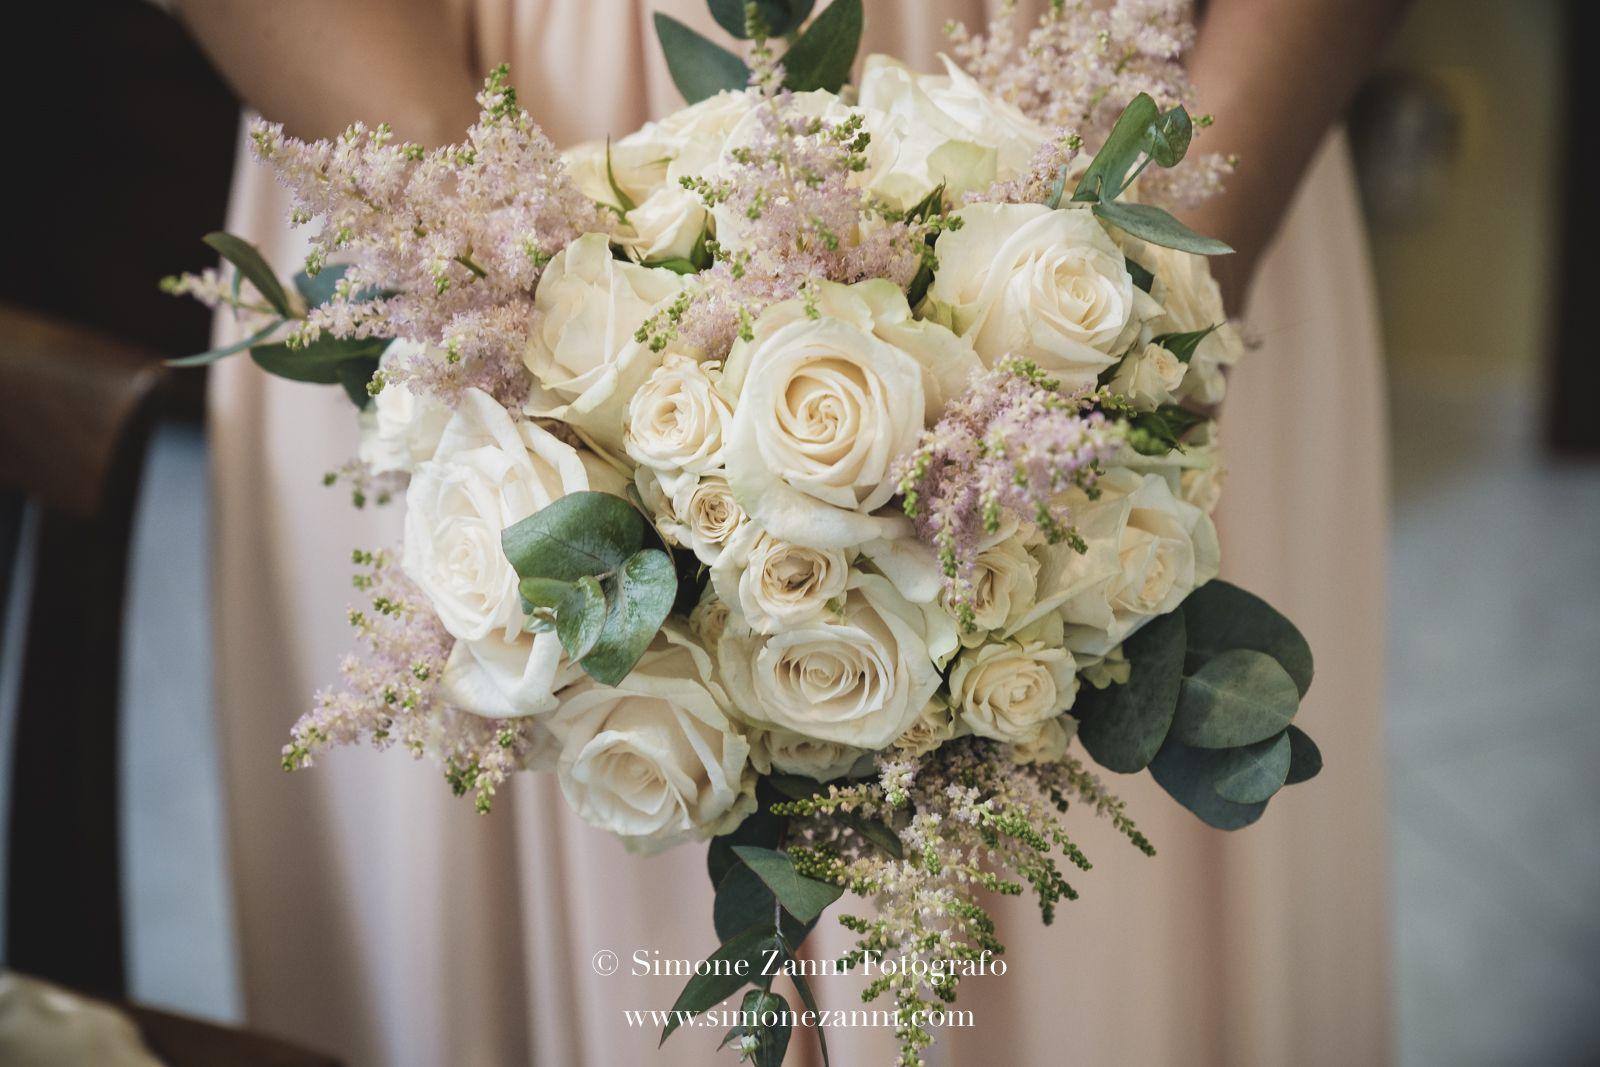 Bouquet Rose Sposa.Bouquet Sposa Rose Vendela Roselline Ramificate Astilbe Rosa Ed